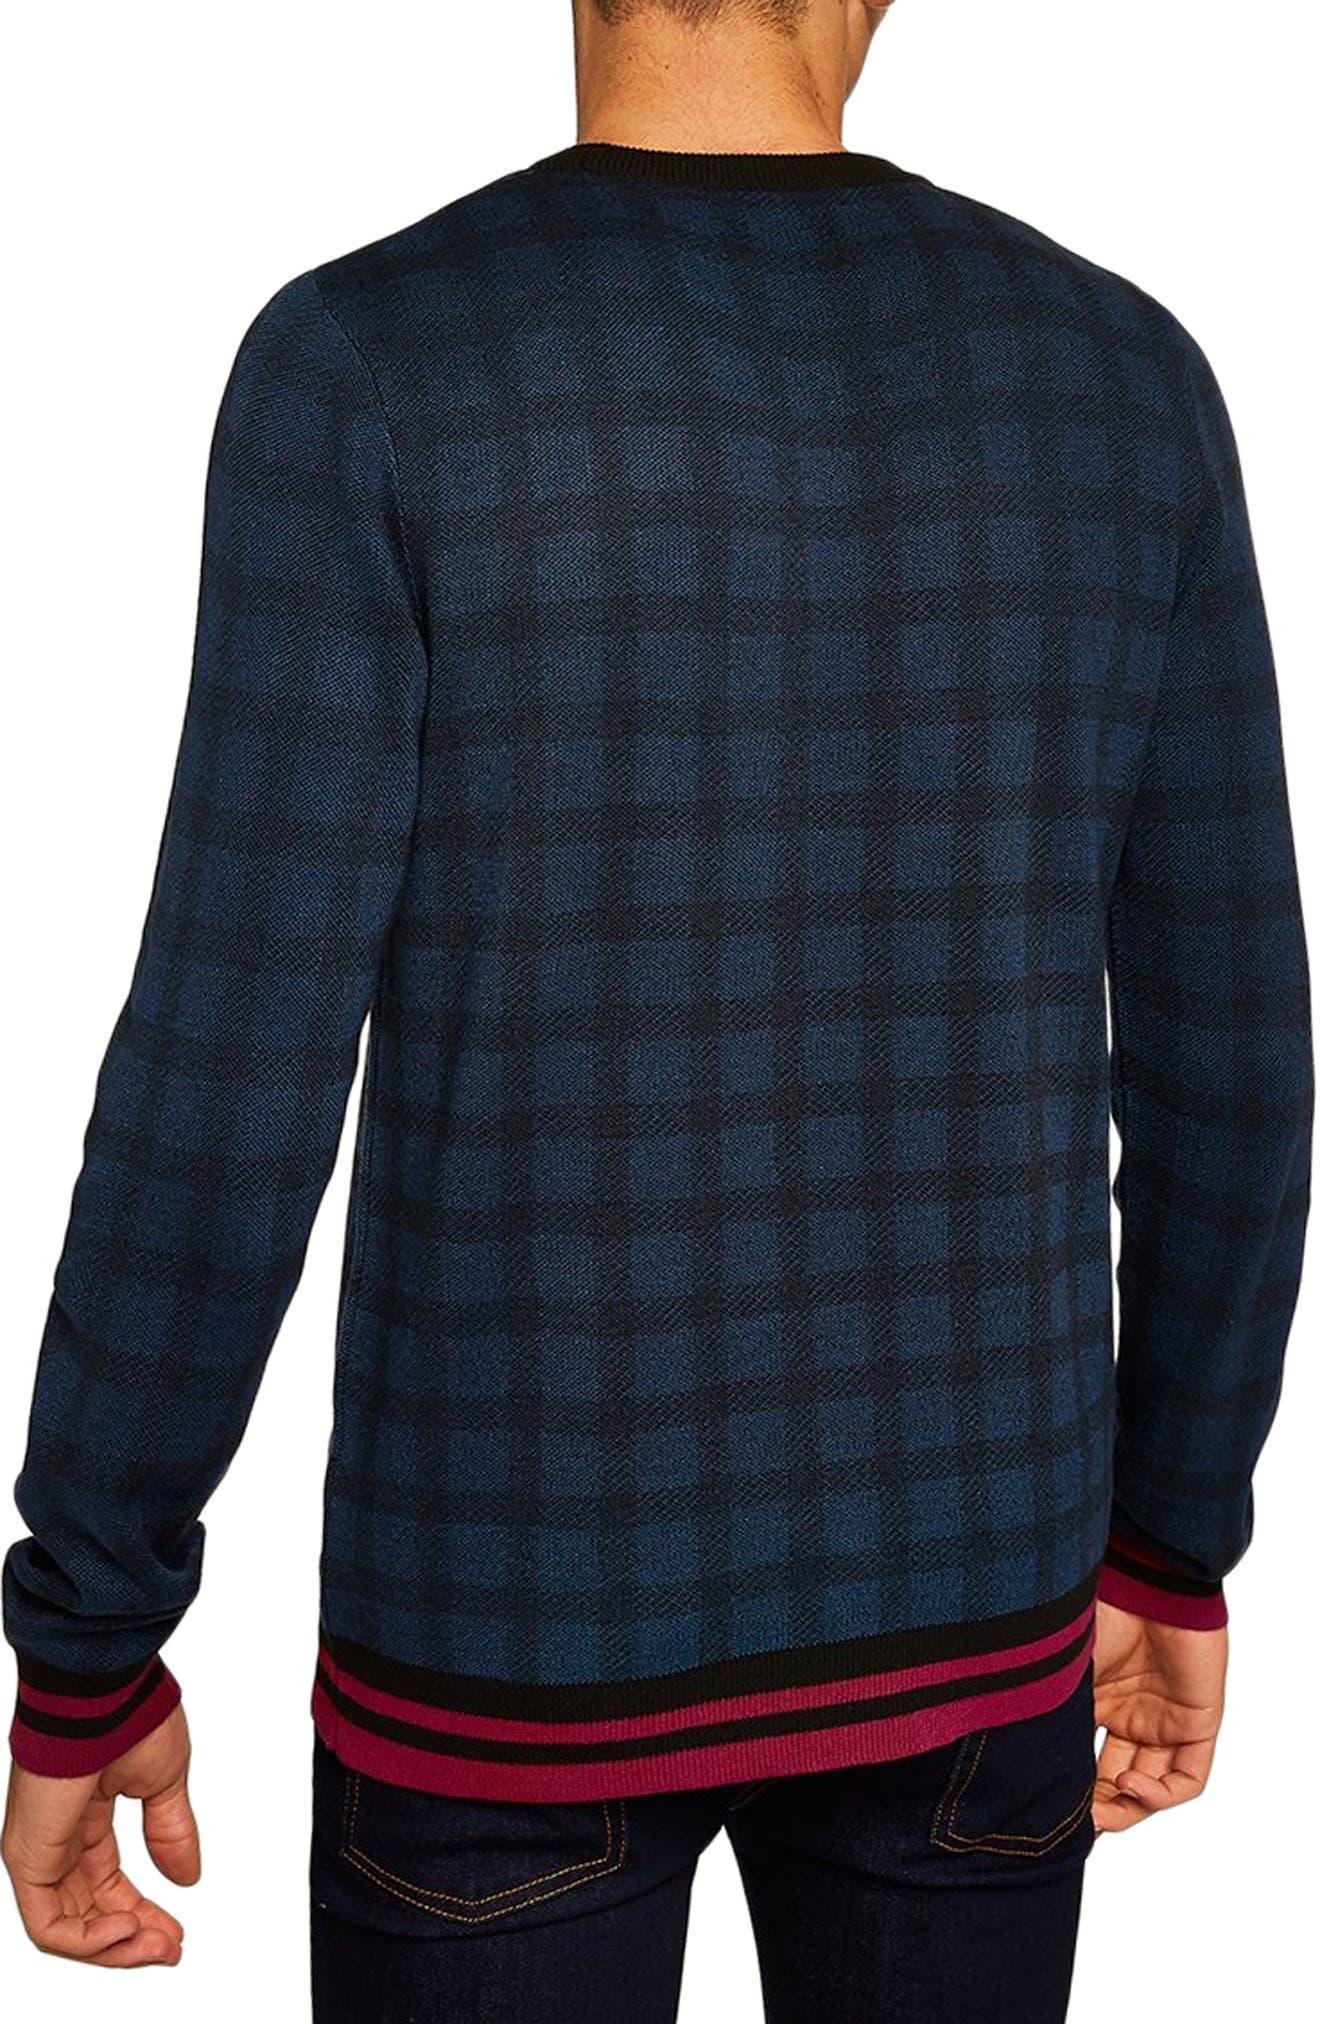 Check Print Classic Fit Sweater,                             Alternate thumbnail 2, color,                             BLUE MULTI